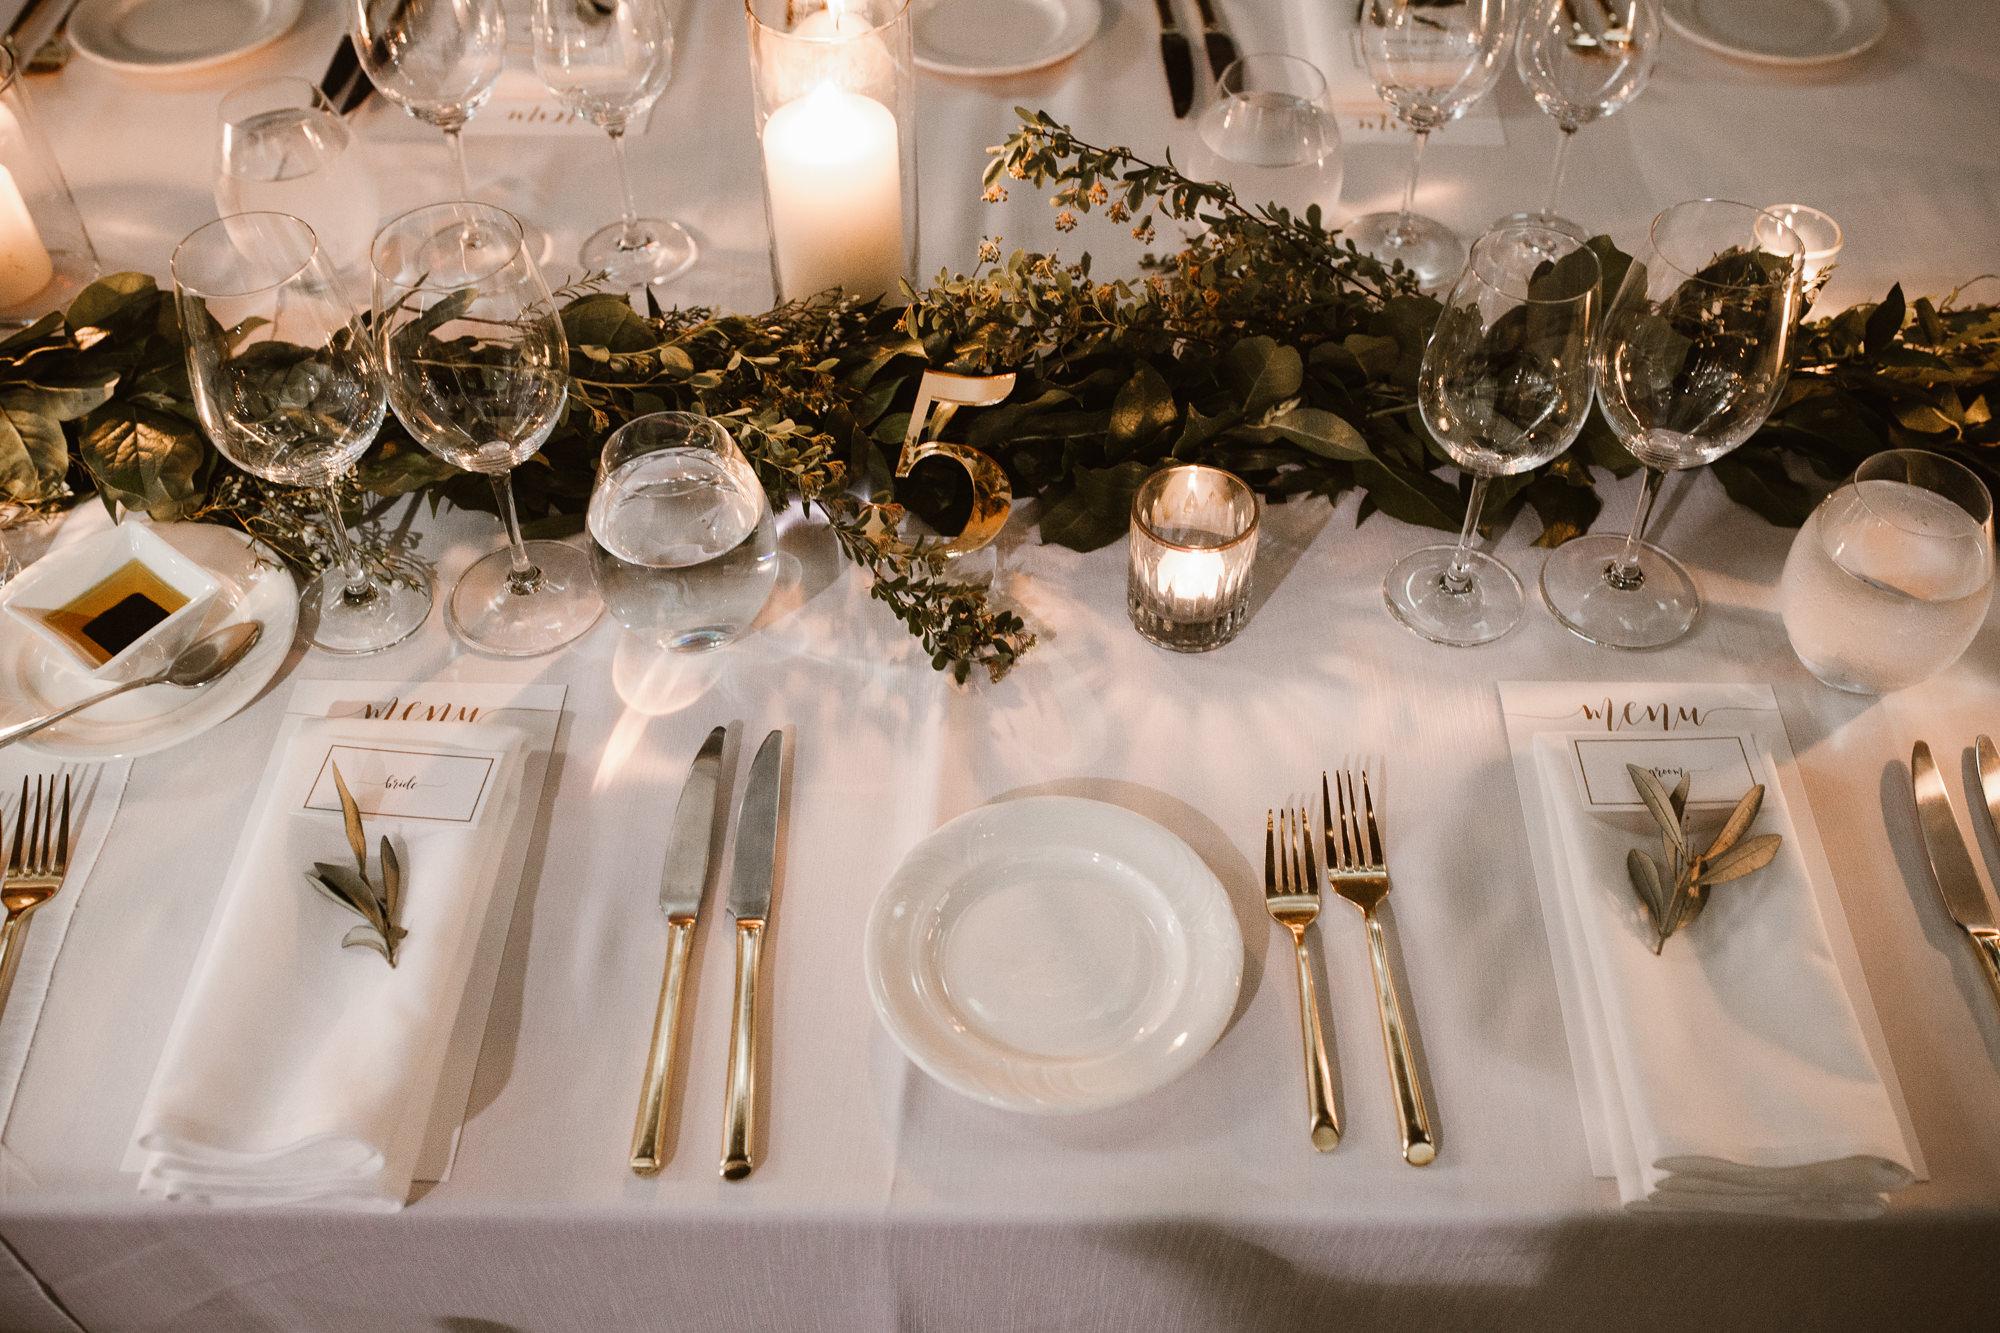 stratus-winery-wedding-vineyard-wedding-vineyard-bride-photo-by-reed-photography-050.jpg